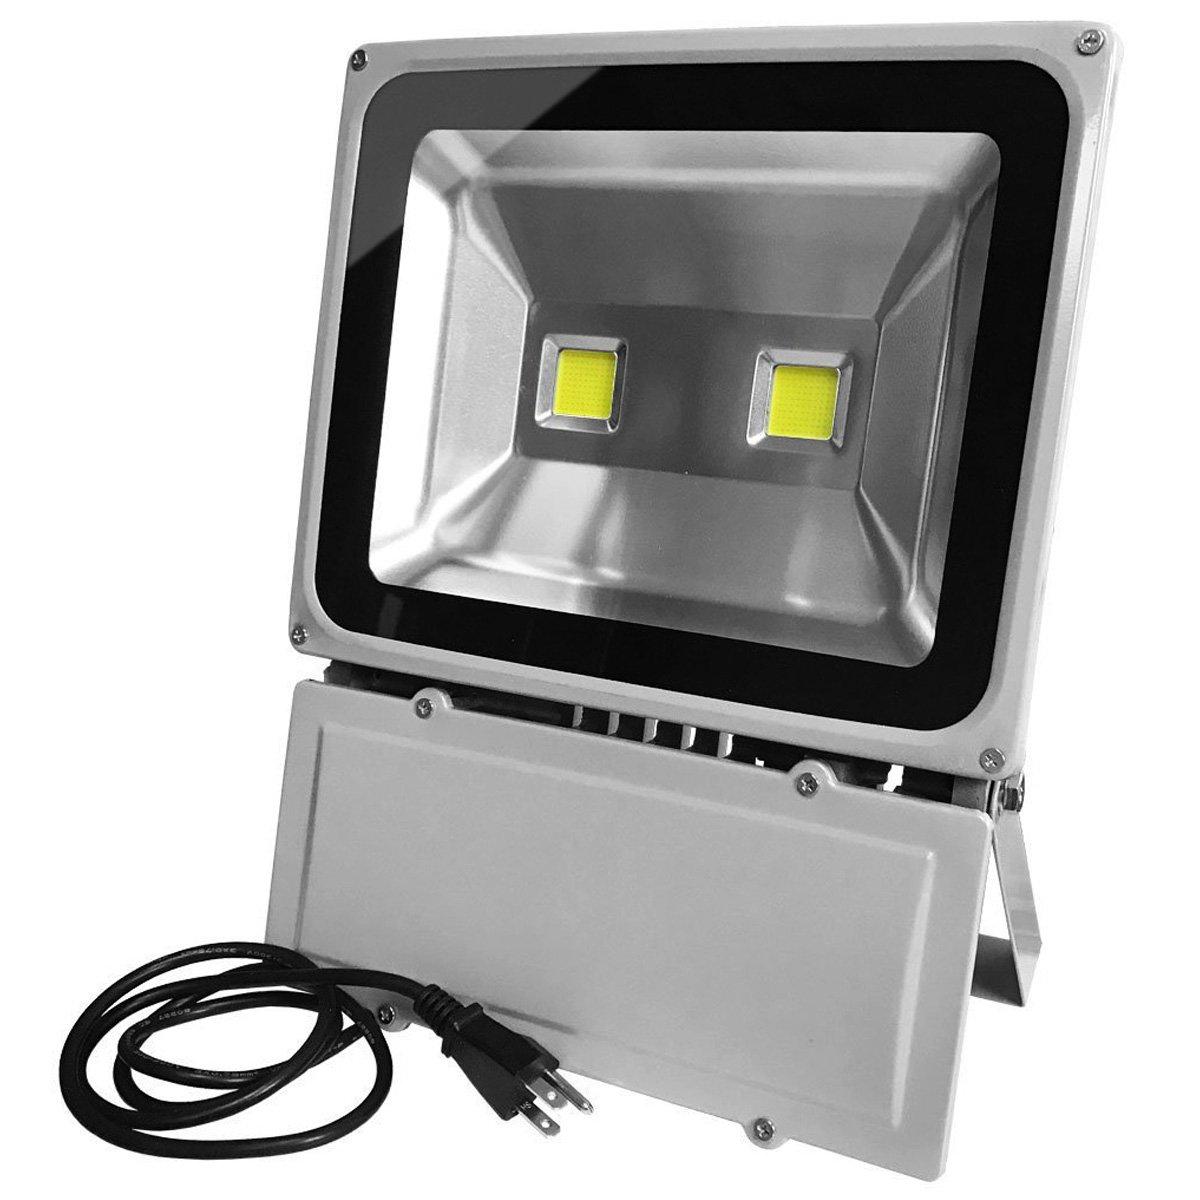 600w Led Flood Light Waterproof Outdoor Lamp Super Bright